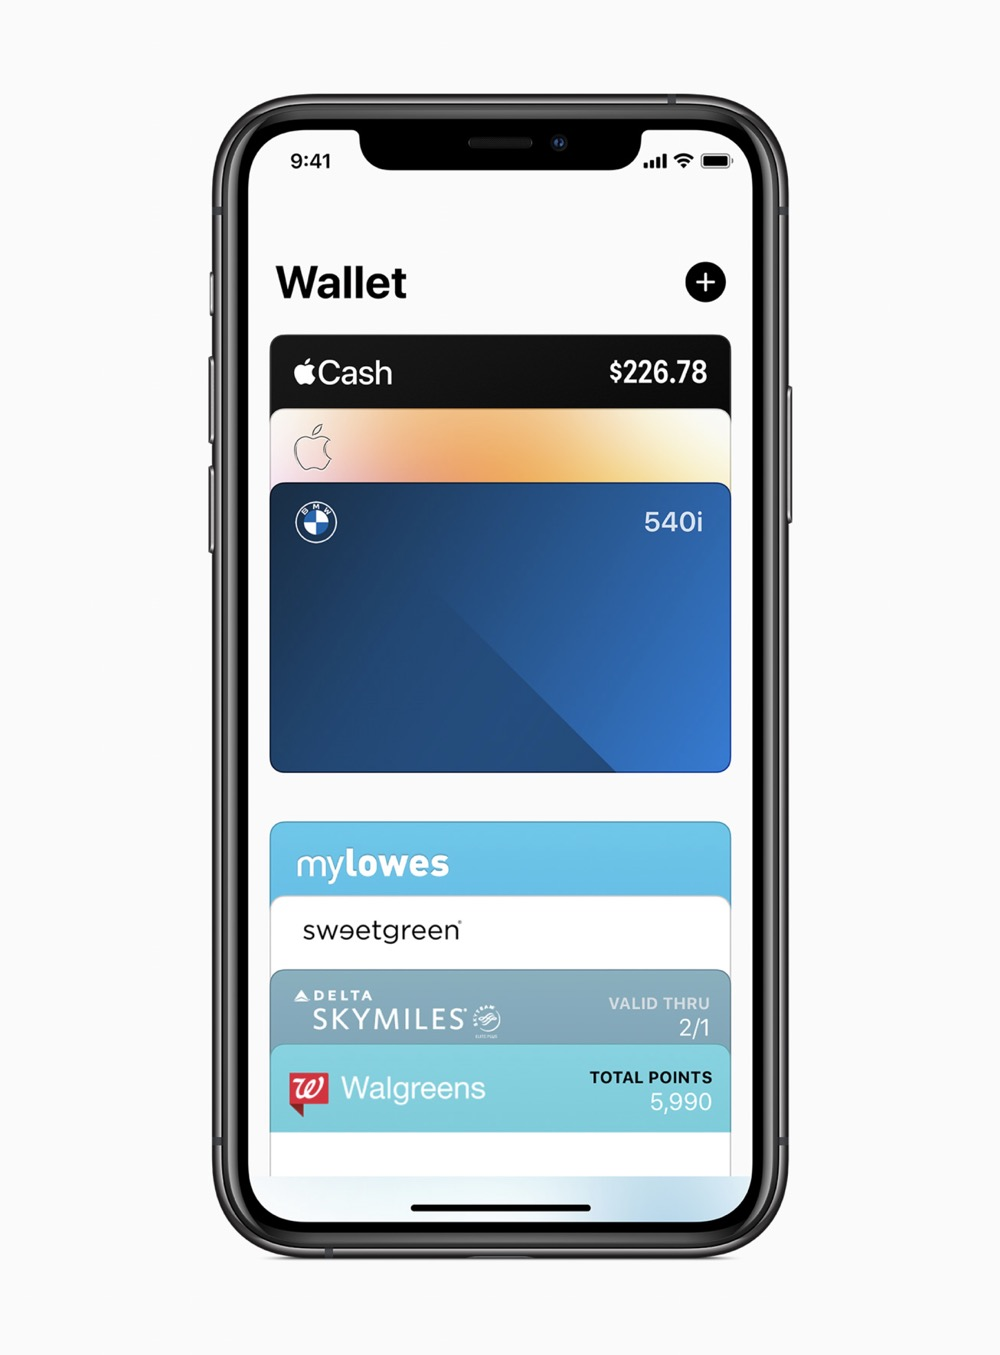 Apple ios14 wallet screen 06222020